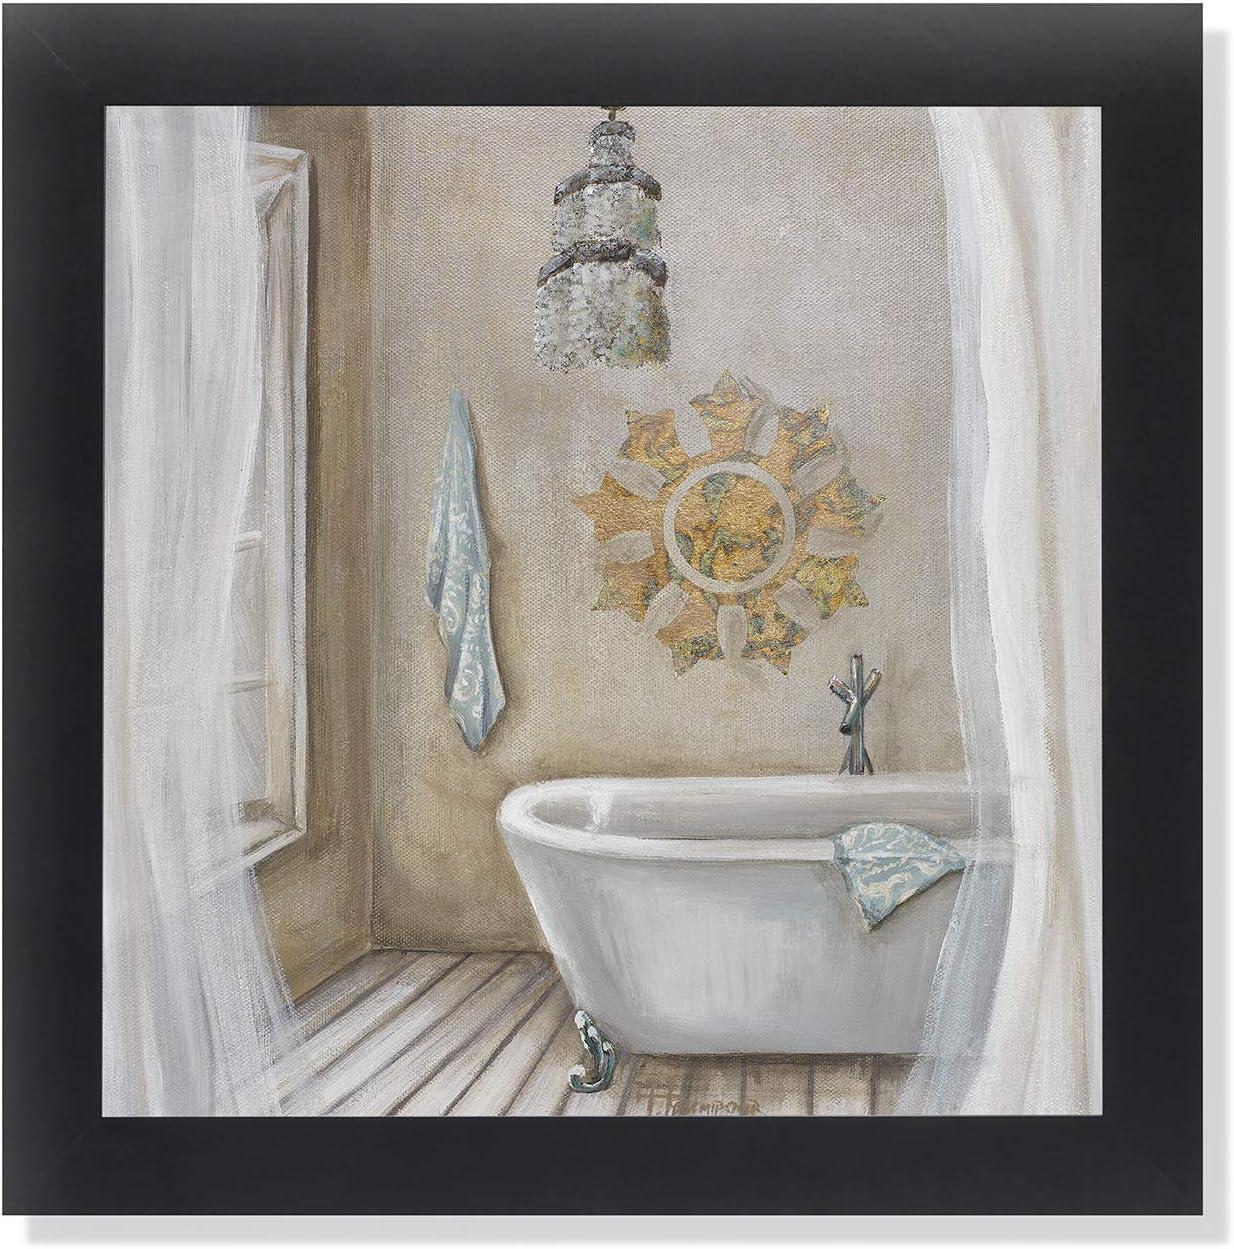 Amazon Com Crystal Bath Ii Bathroom Black Framed Art Print Poster 12x12 Posters Prints